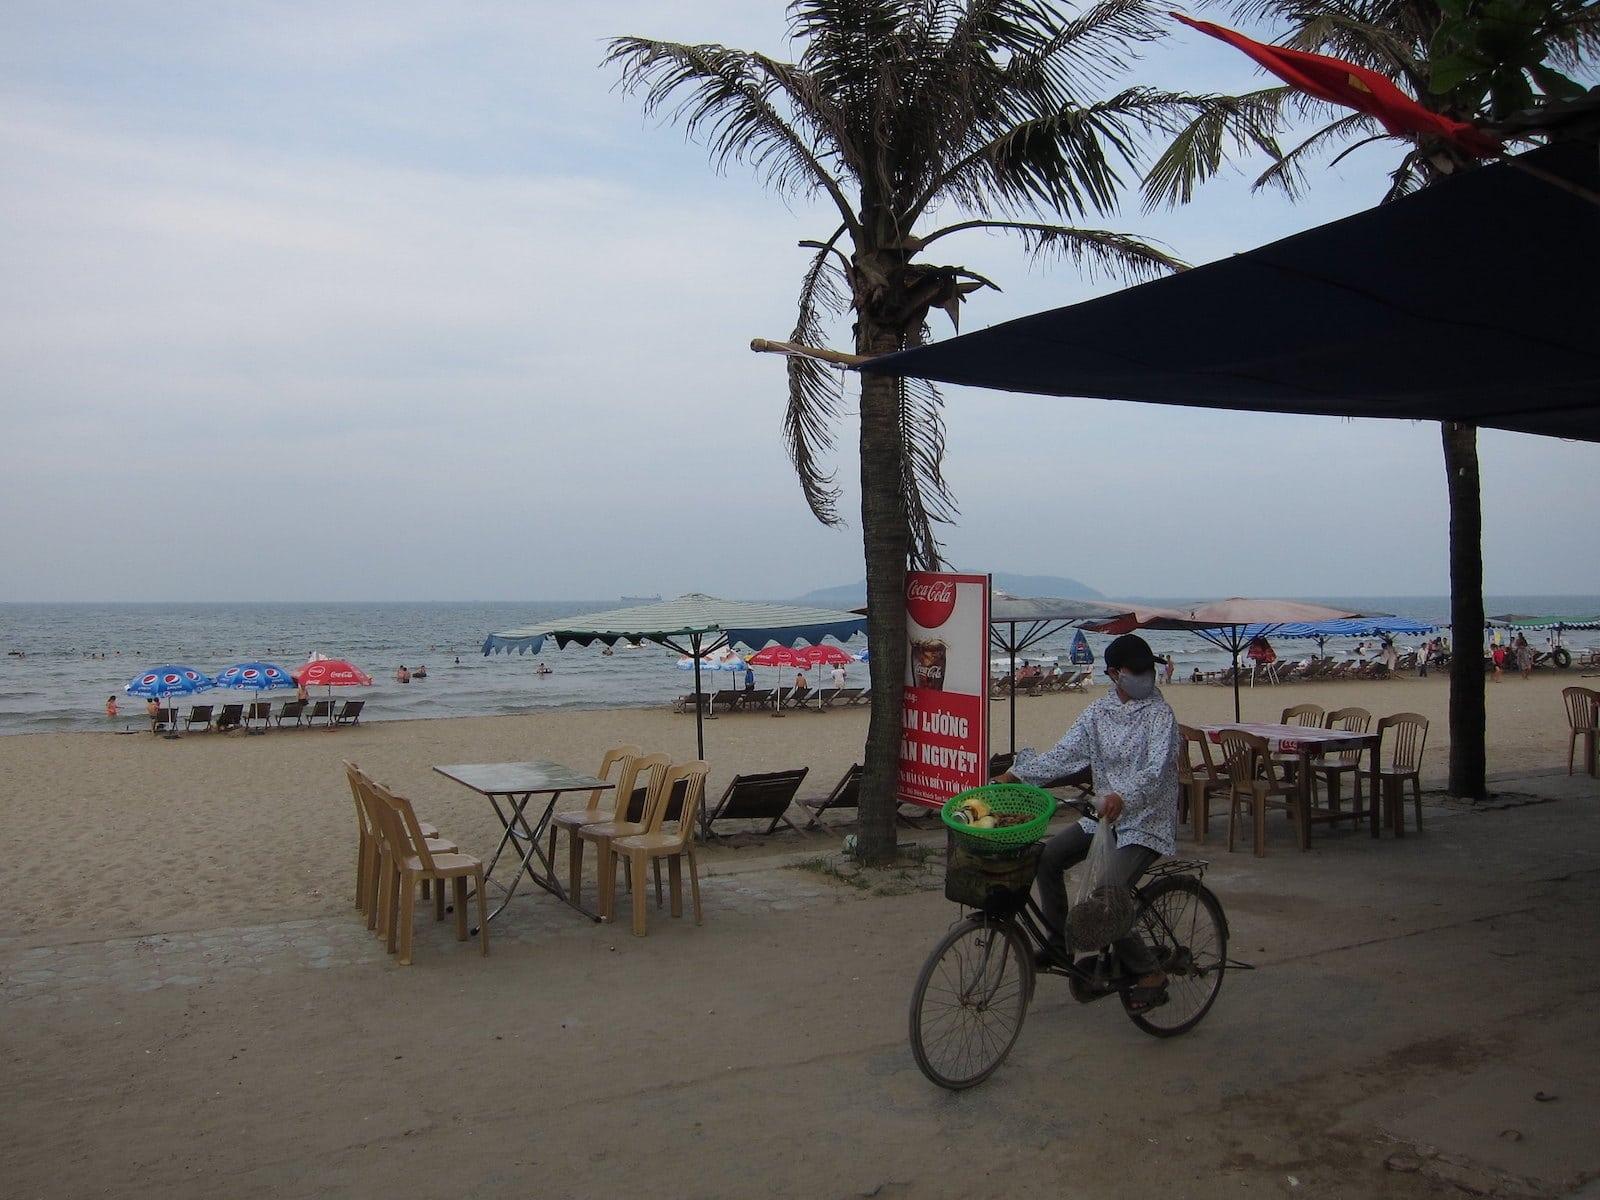 Image of Cua Lo Beach in Vietnam